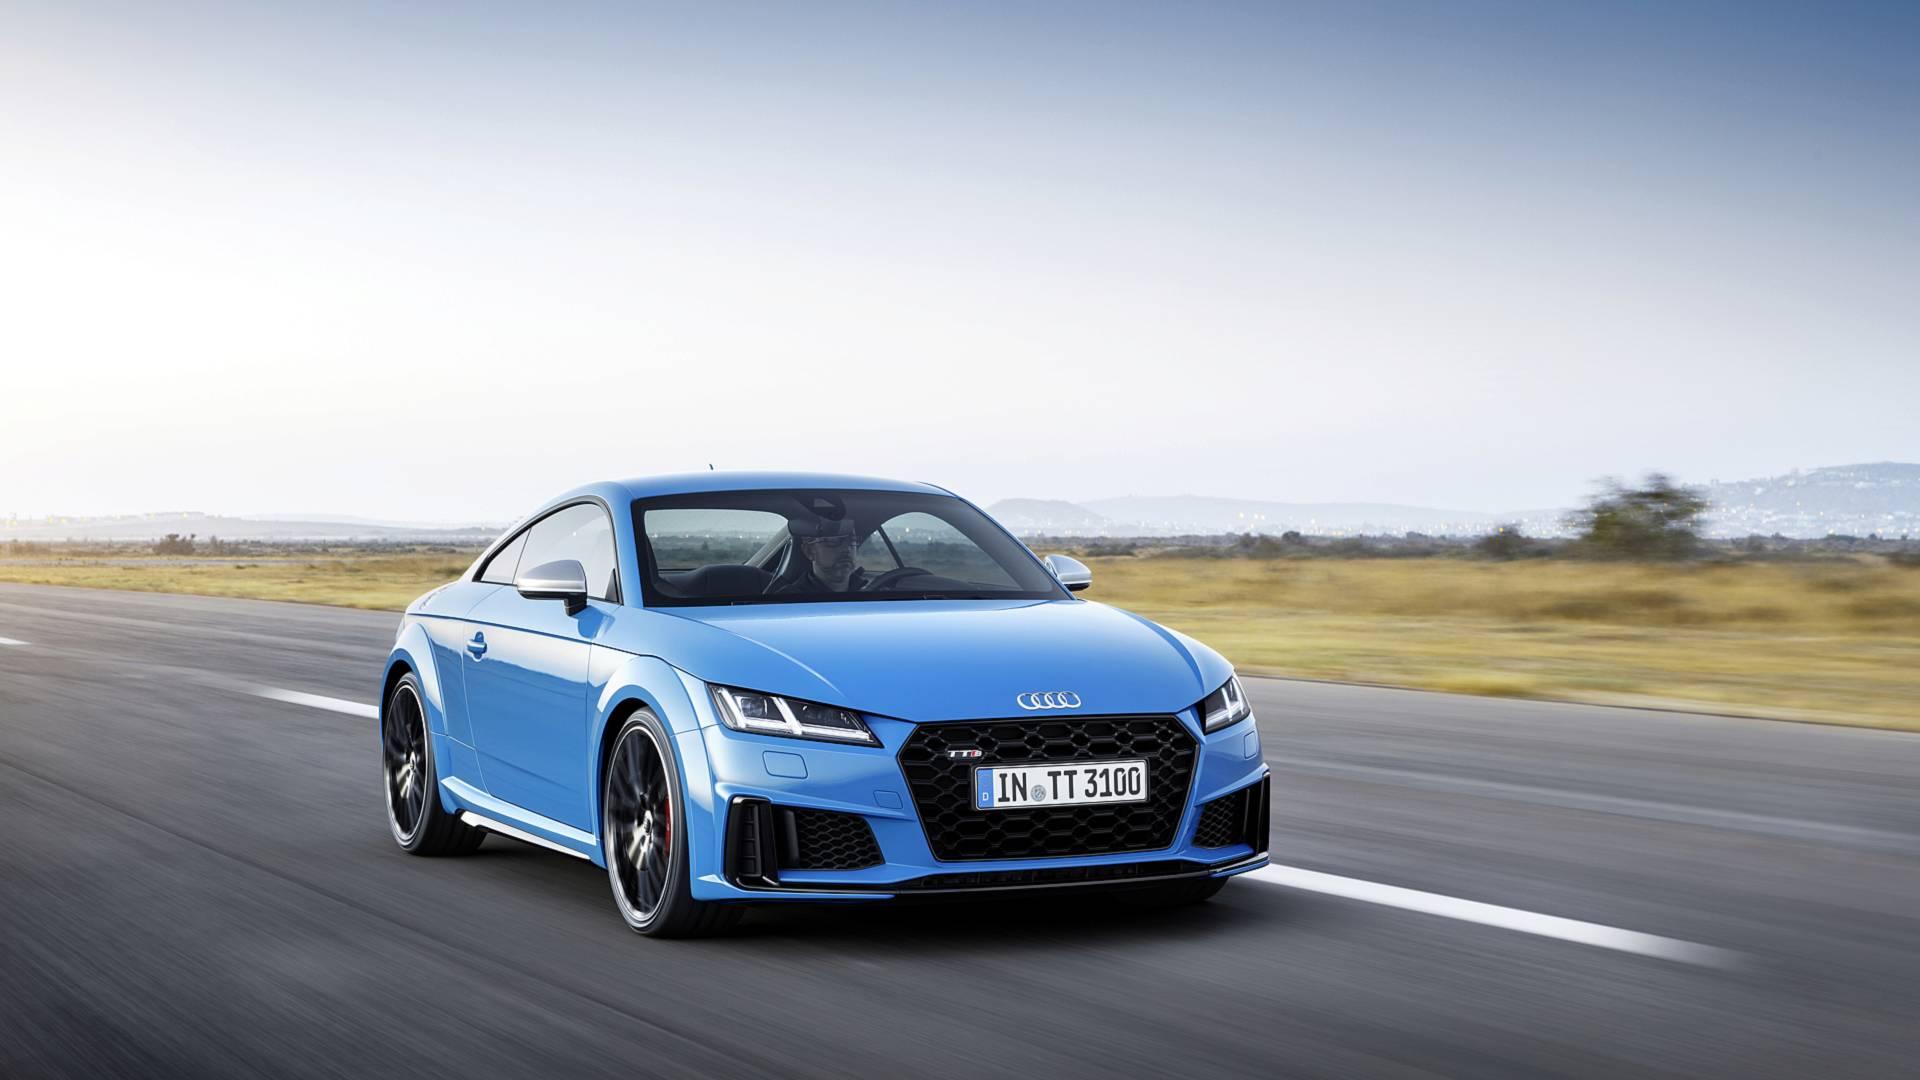 2019 Audi TT Gets More Standard Features, Refined Exterior